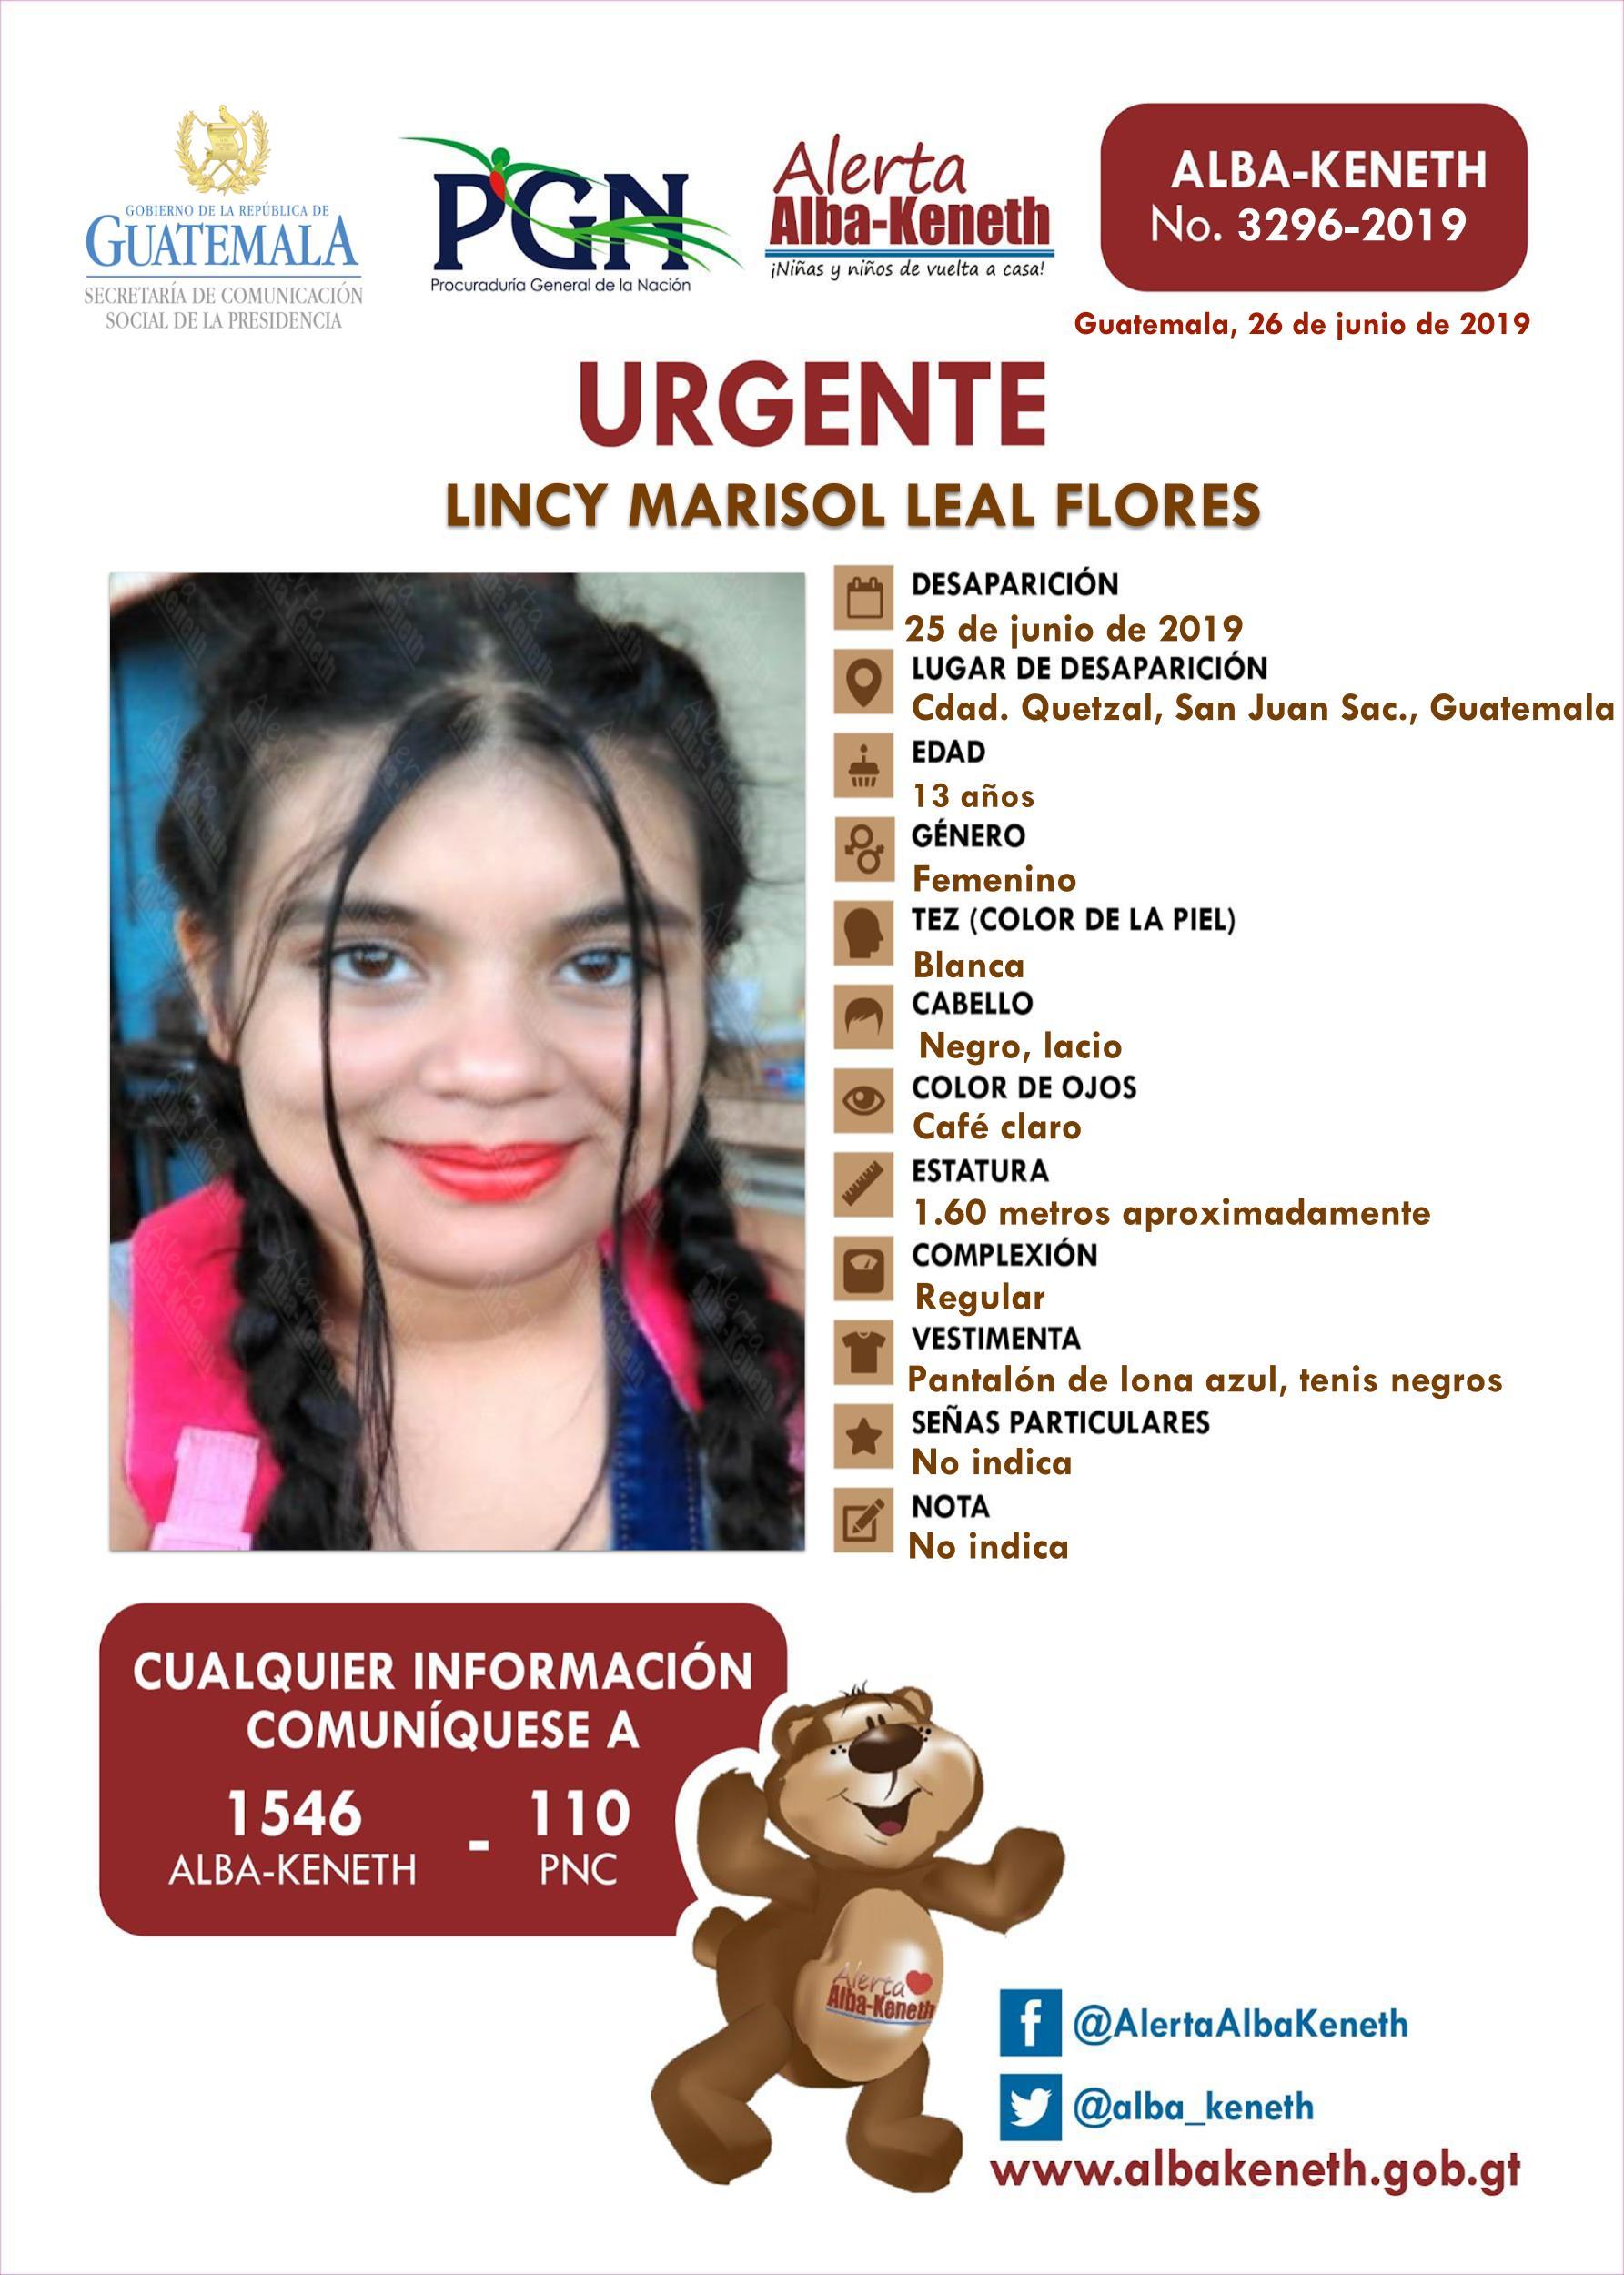 Lincy Marisol Leal Flores